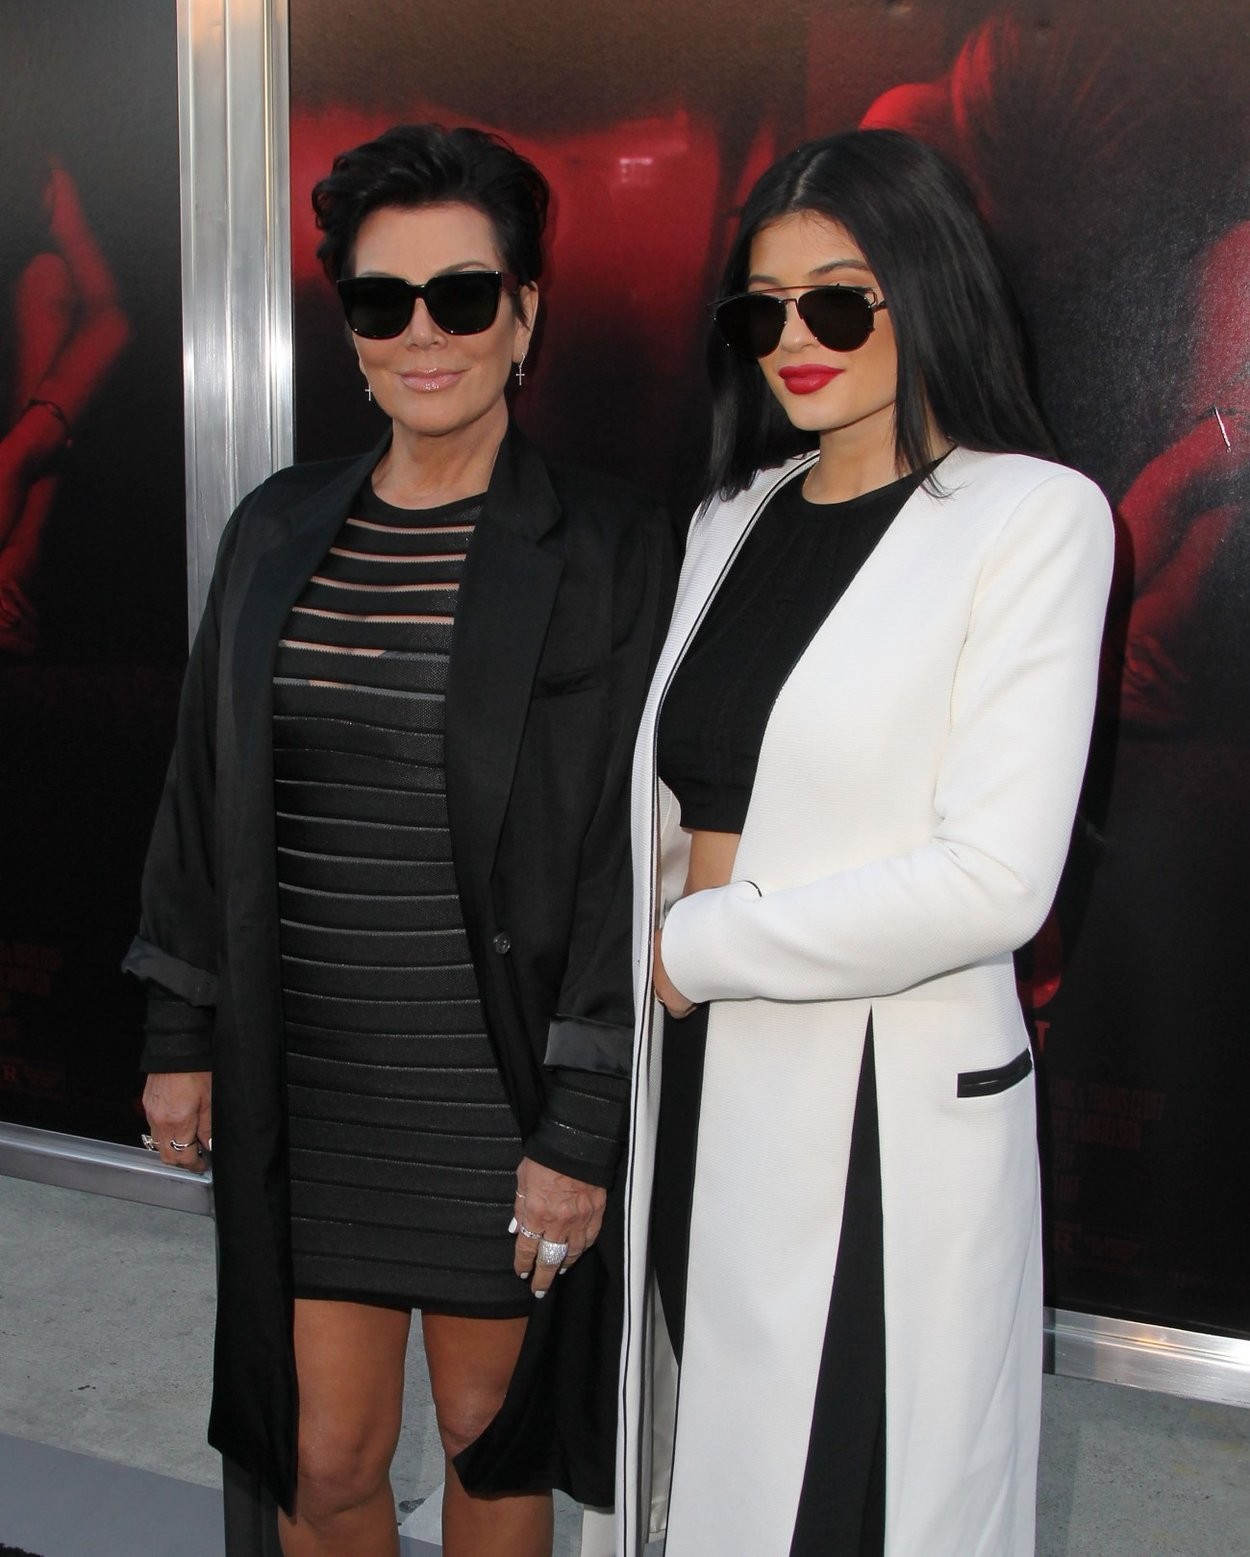 Plant Kris Jenner Kylies gesamte Karriere?